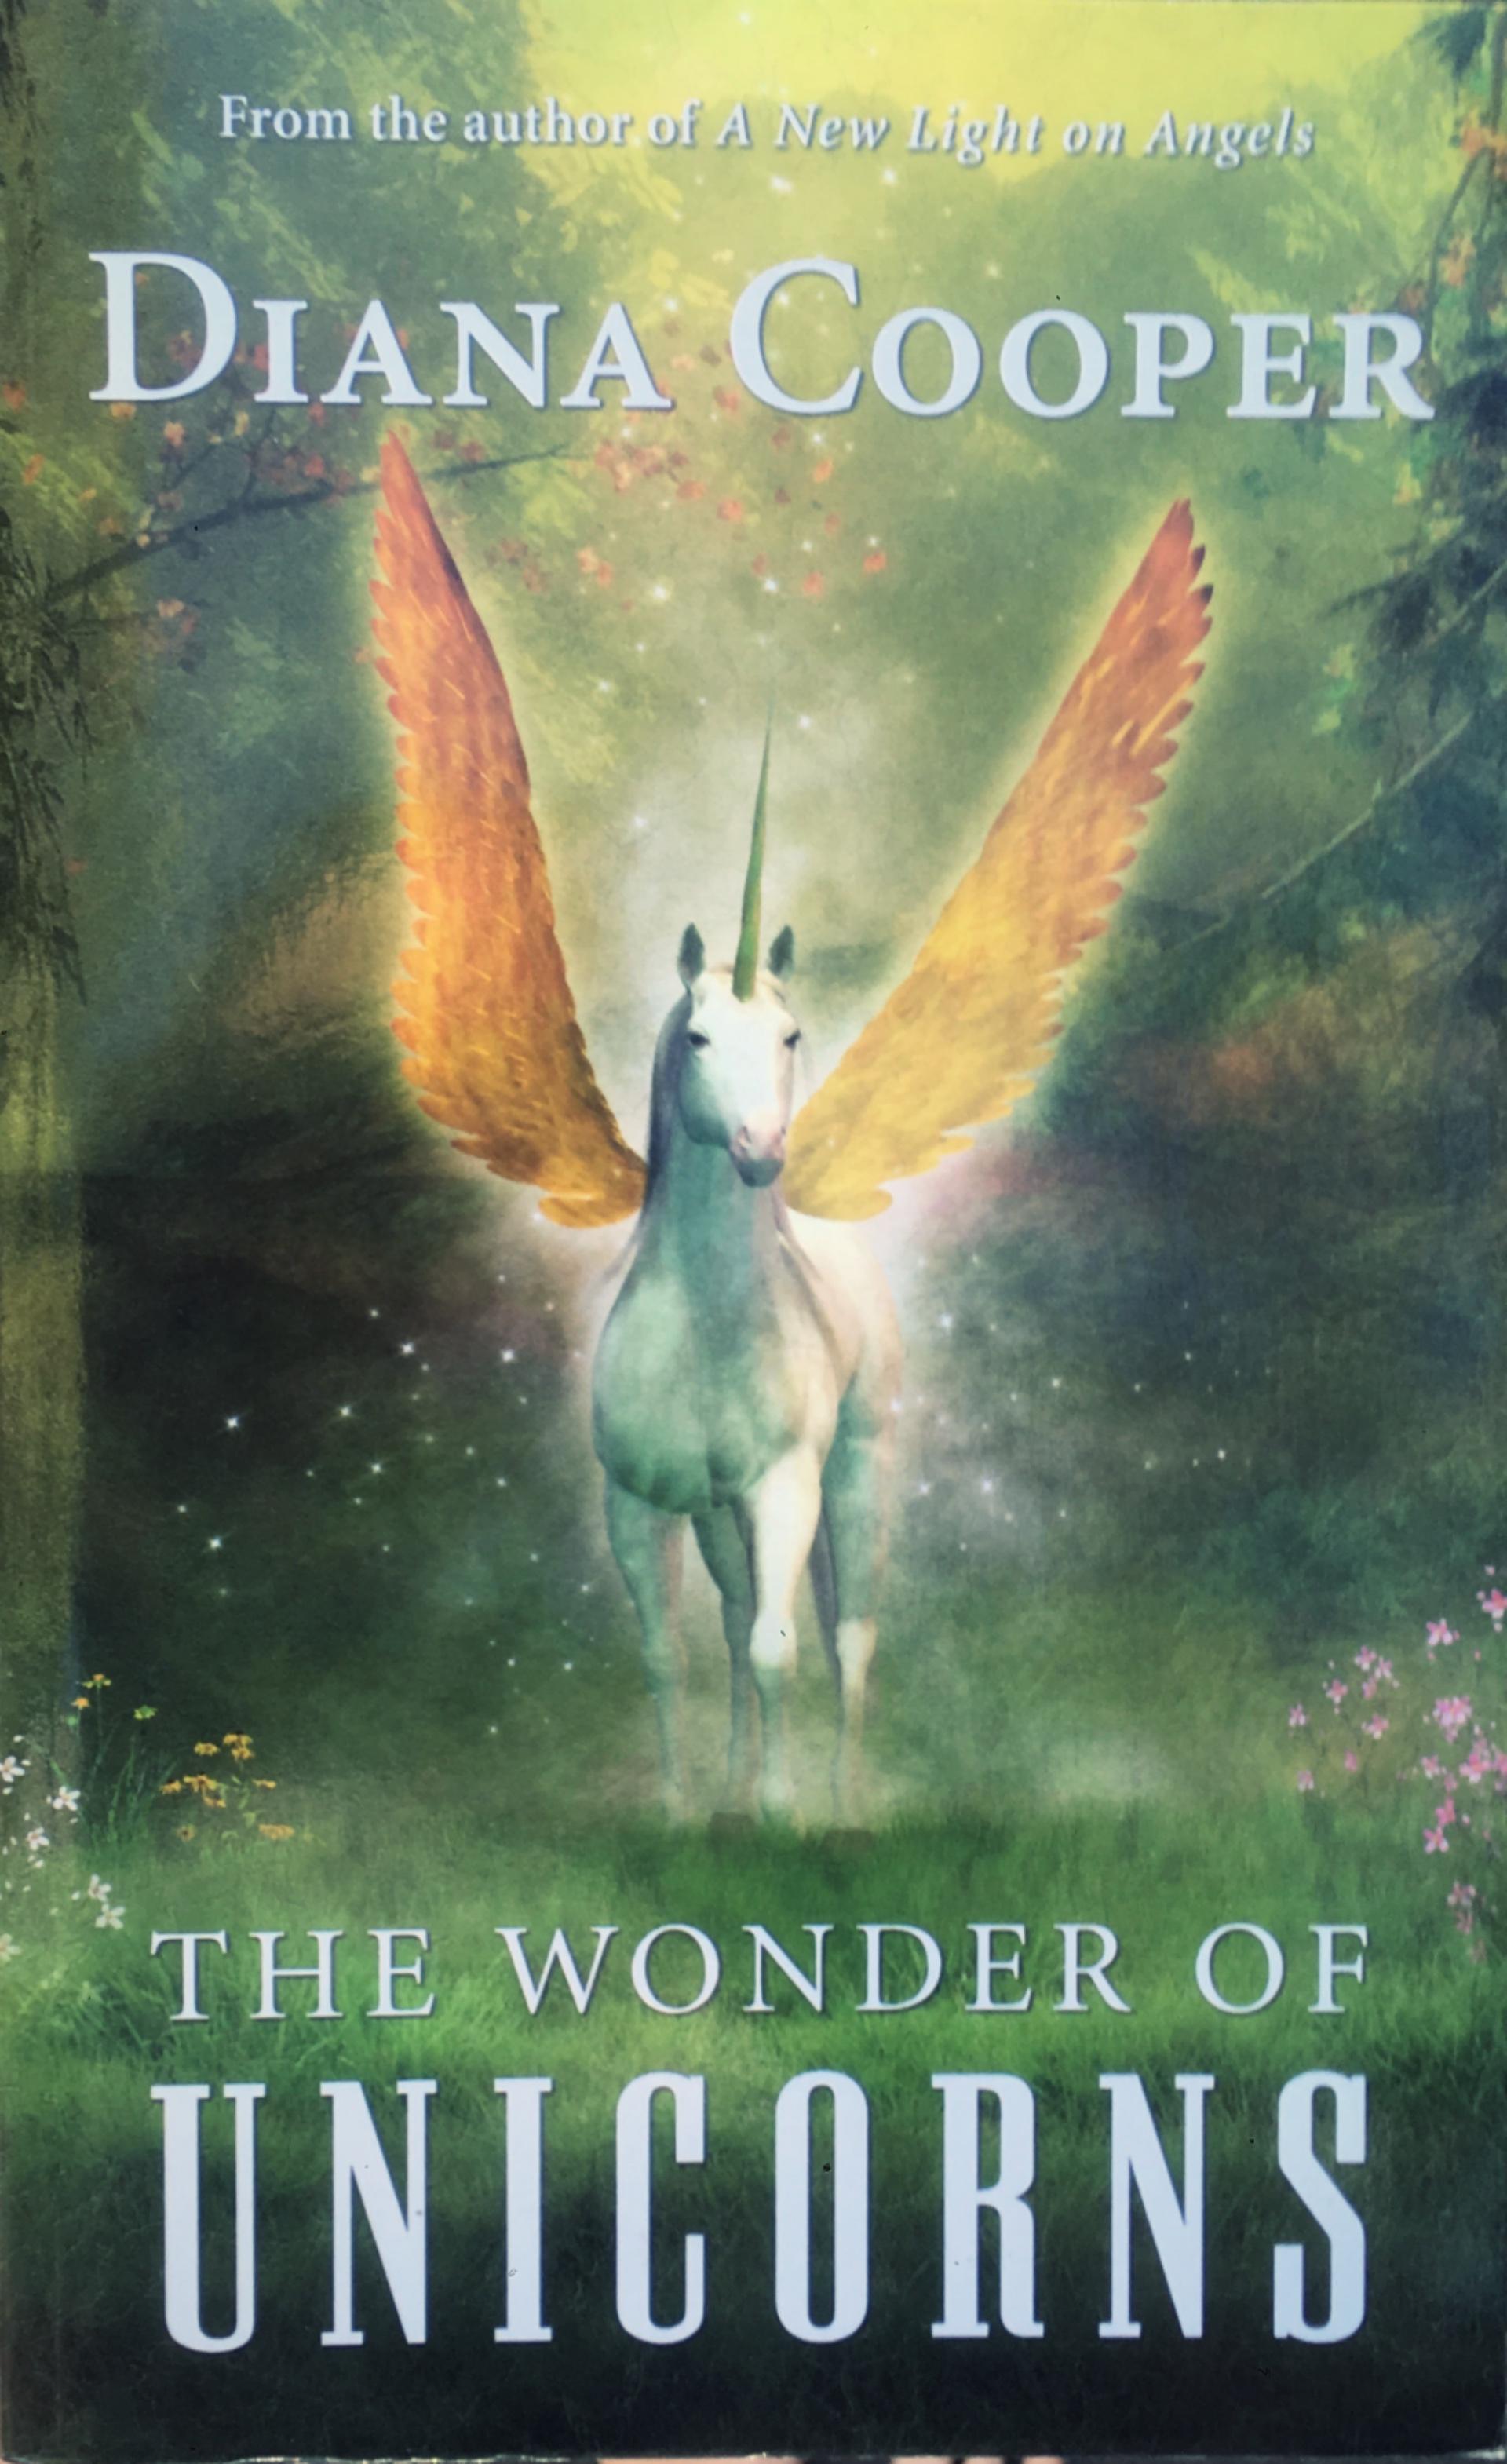 The wonderful unicorns BOOKS.jpg